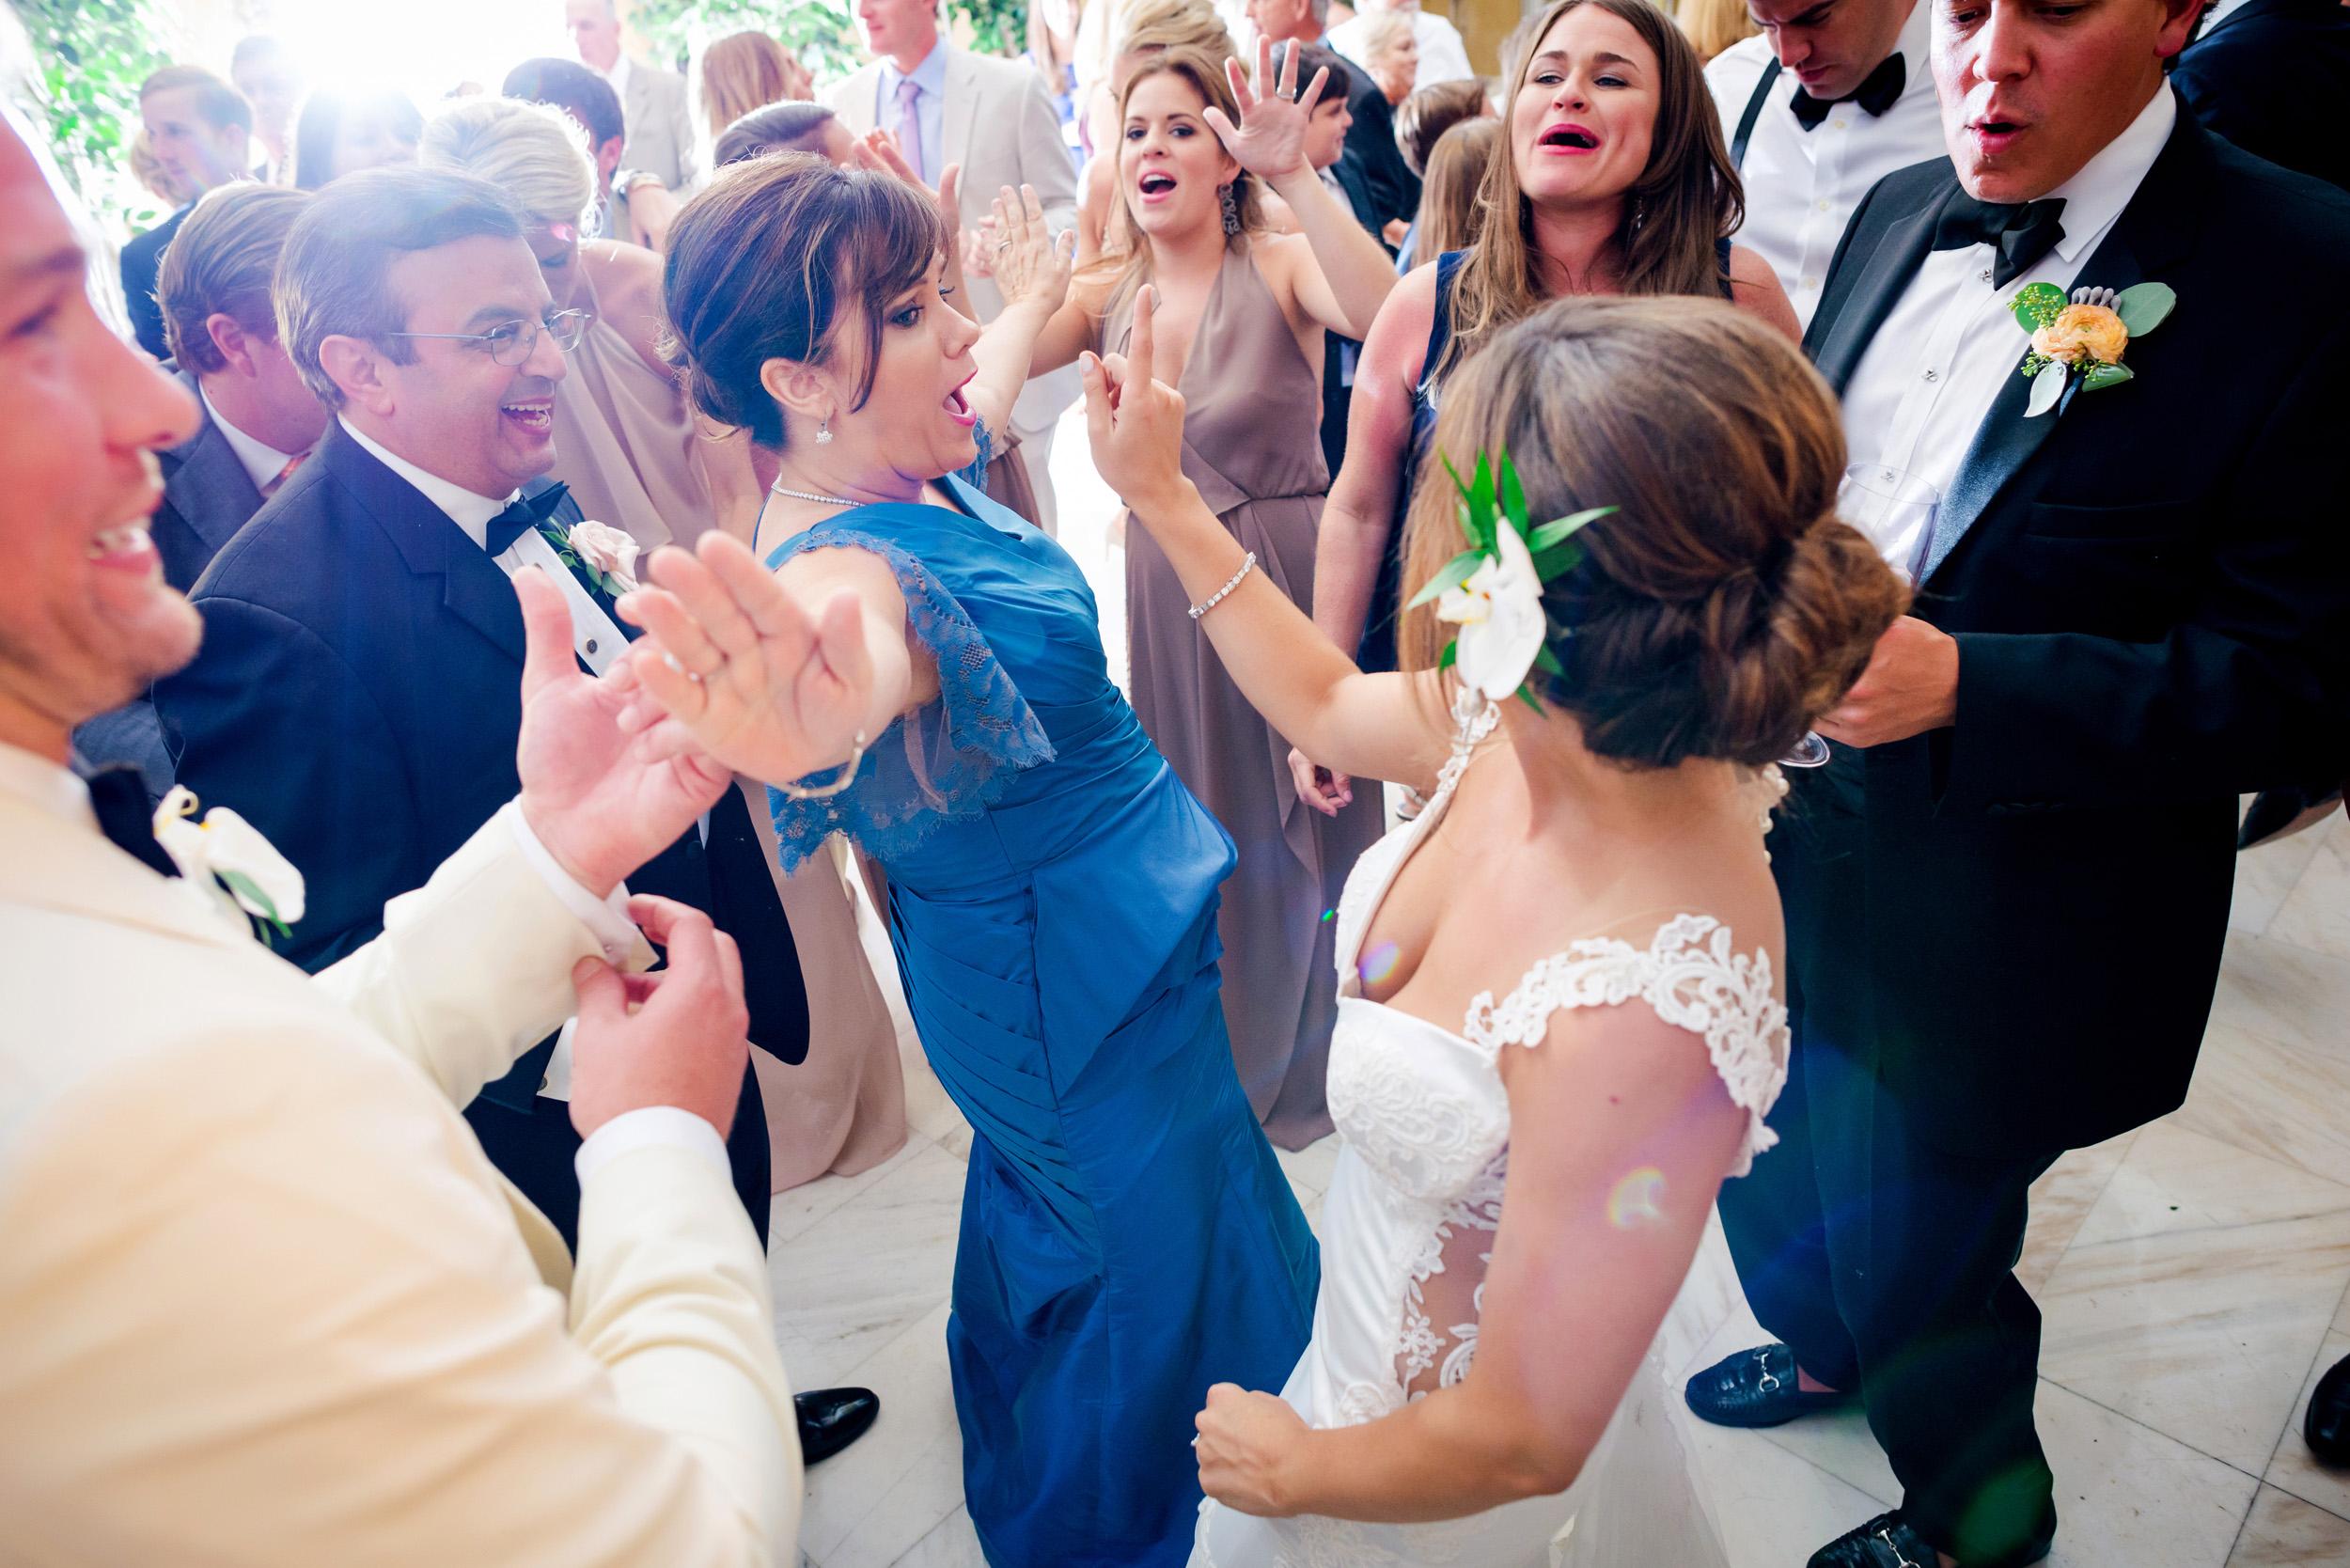 Colorado-Springs-Wedding-Photography-SS-010.jpg